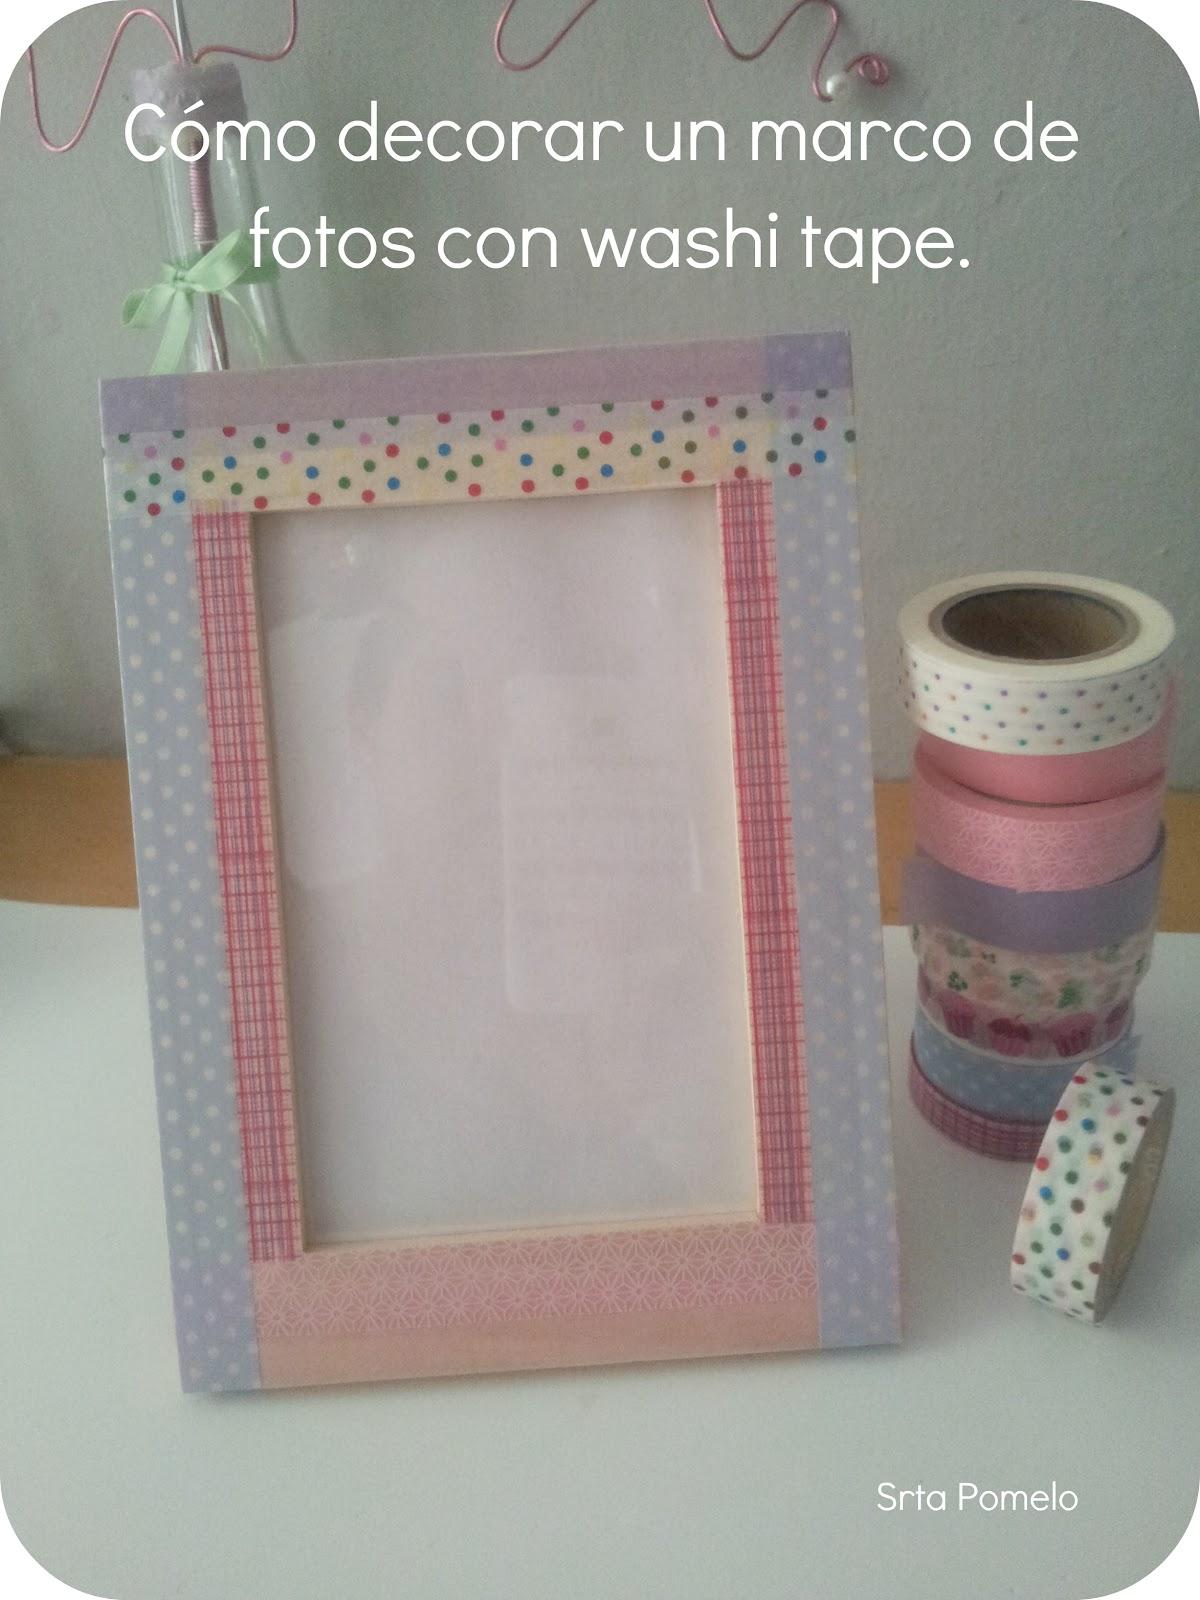 Srta pomelo tutorial c mo decorar un marco de fotos con - Decorar con washi tape ...